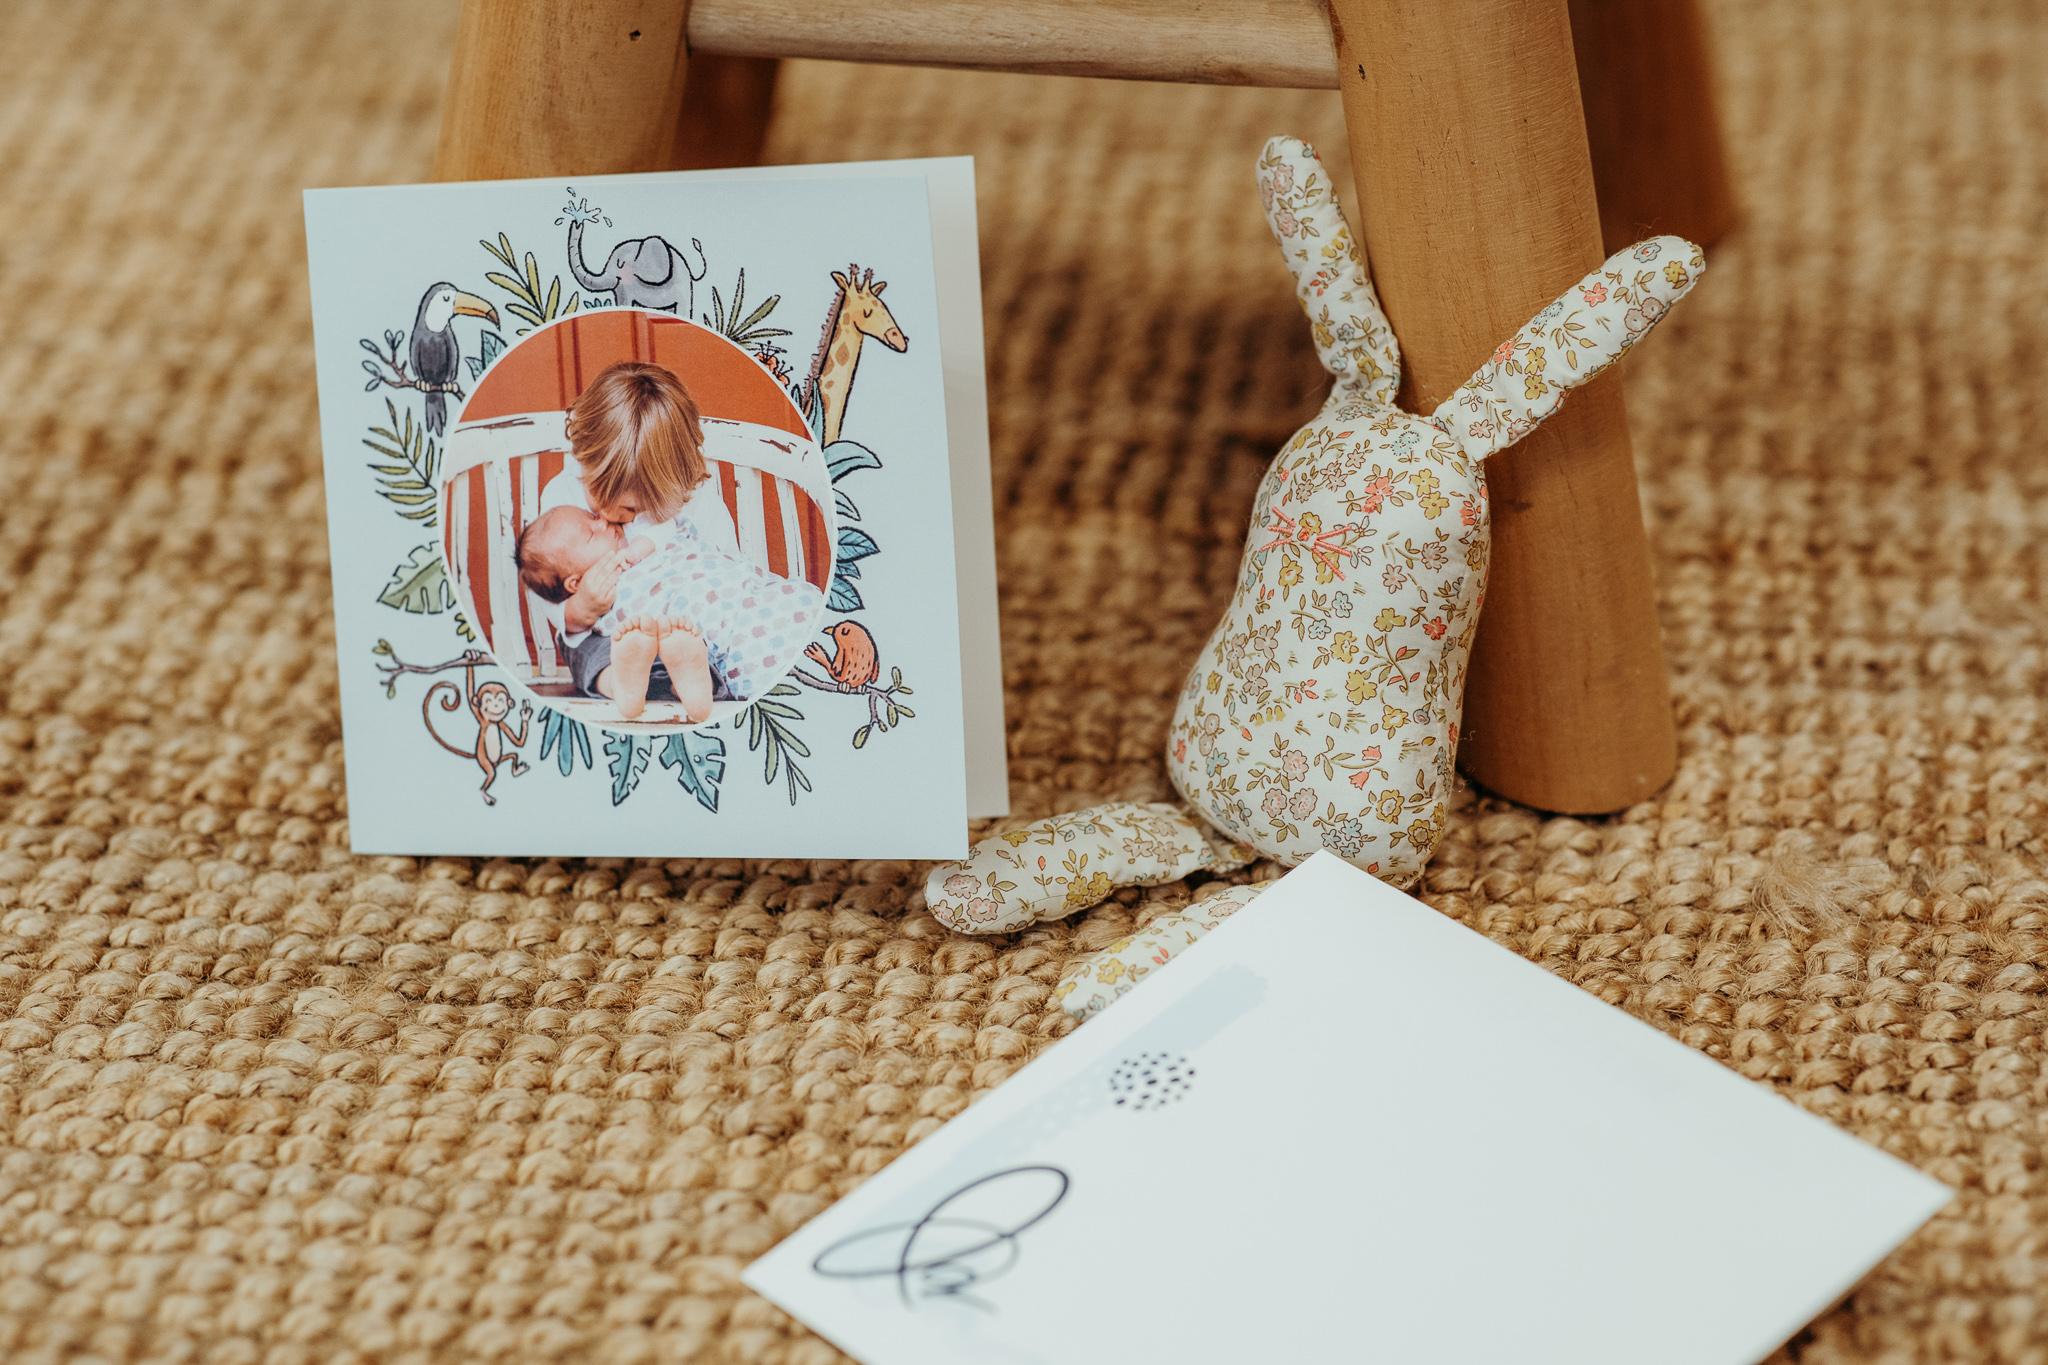 carte sur tapis en coco avec doudou lapin